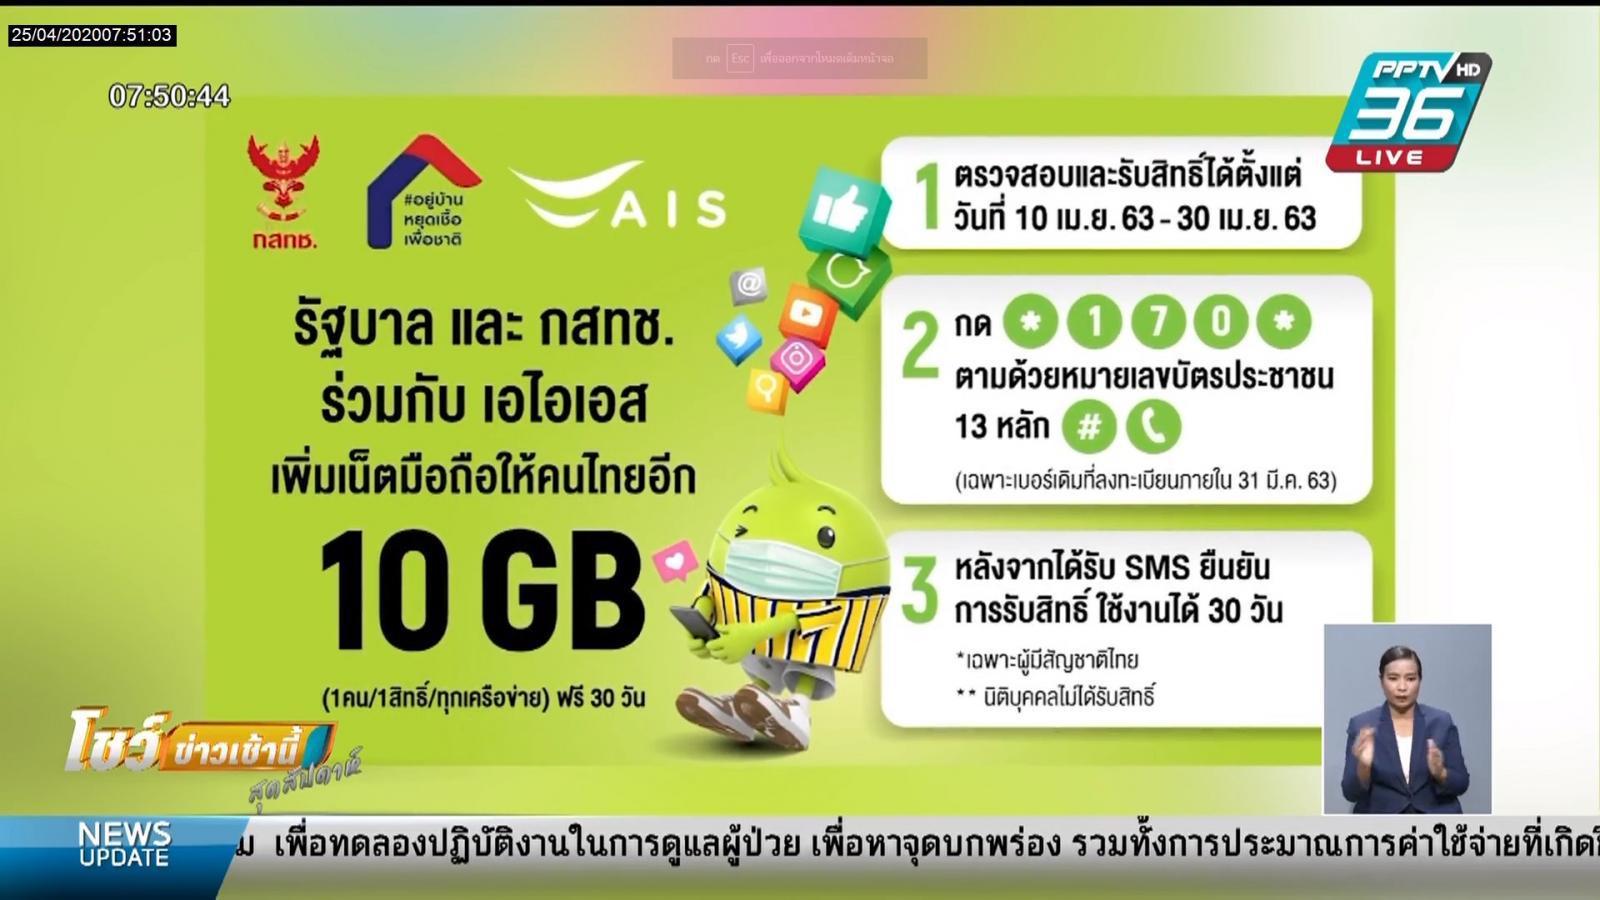 AIS เน็ตฟรี 10 GB